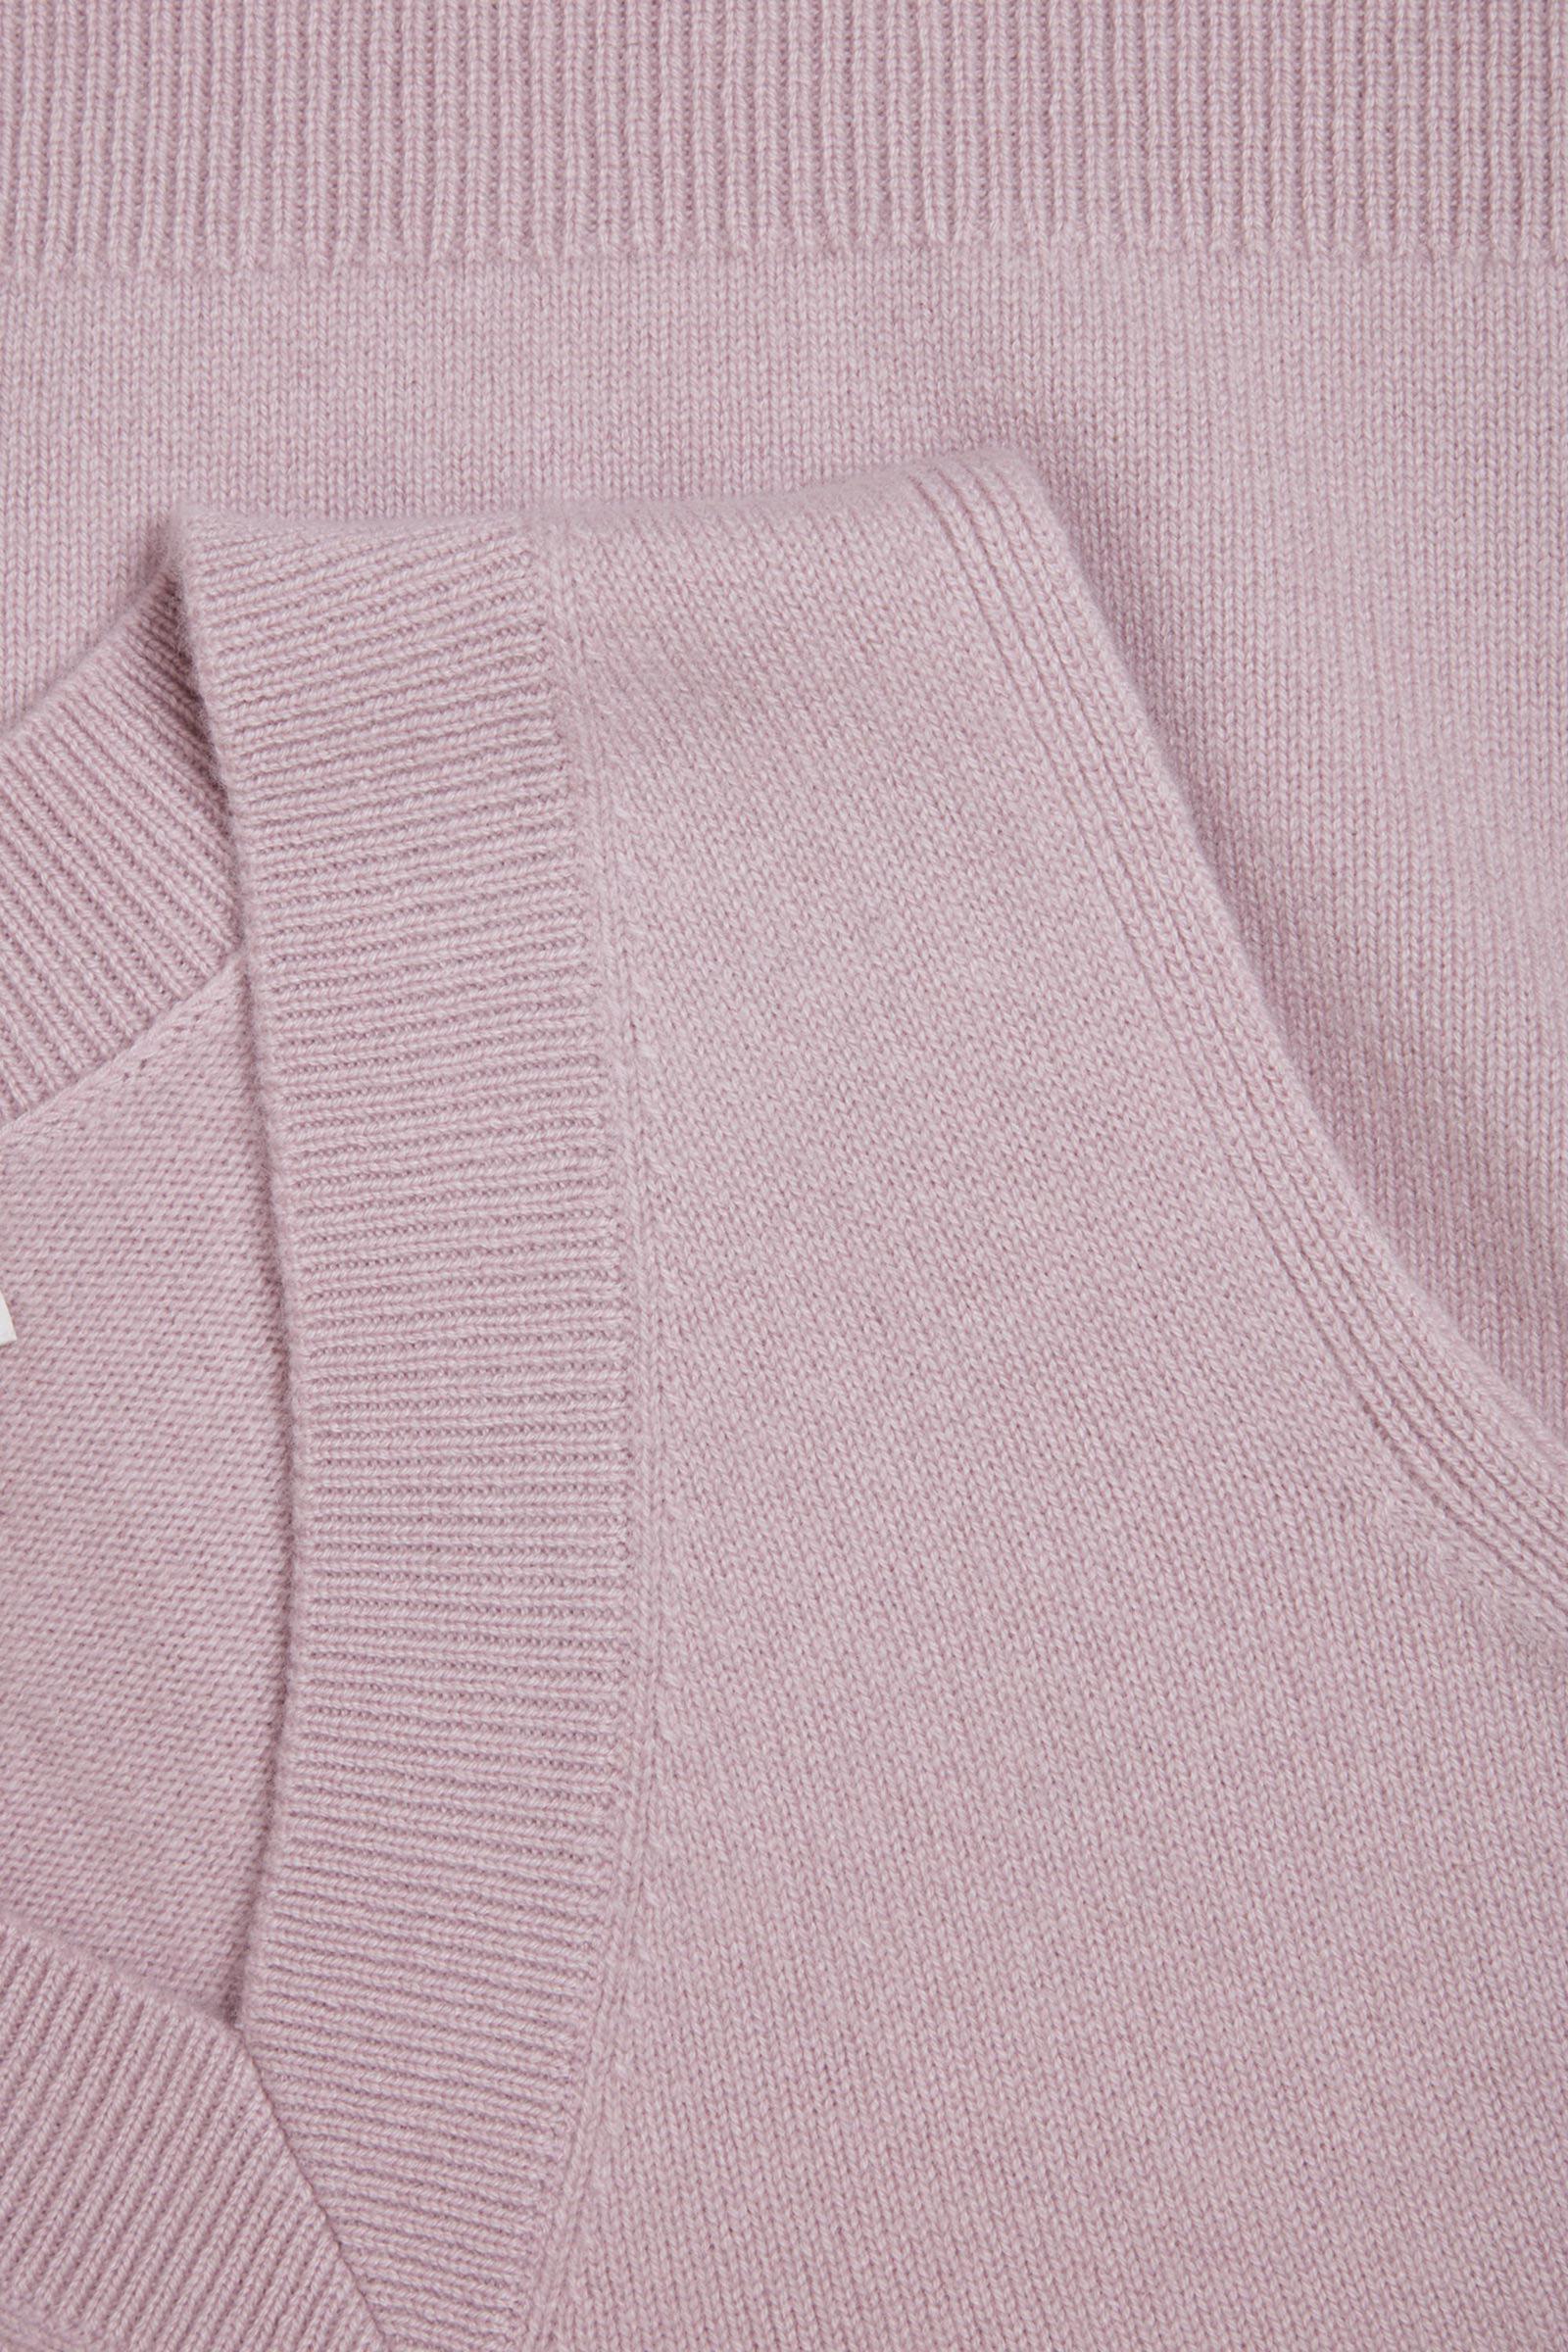 COS V넥 캐시미어 베스트의 핑크컬러 Detail입니다.